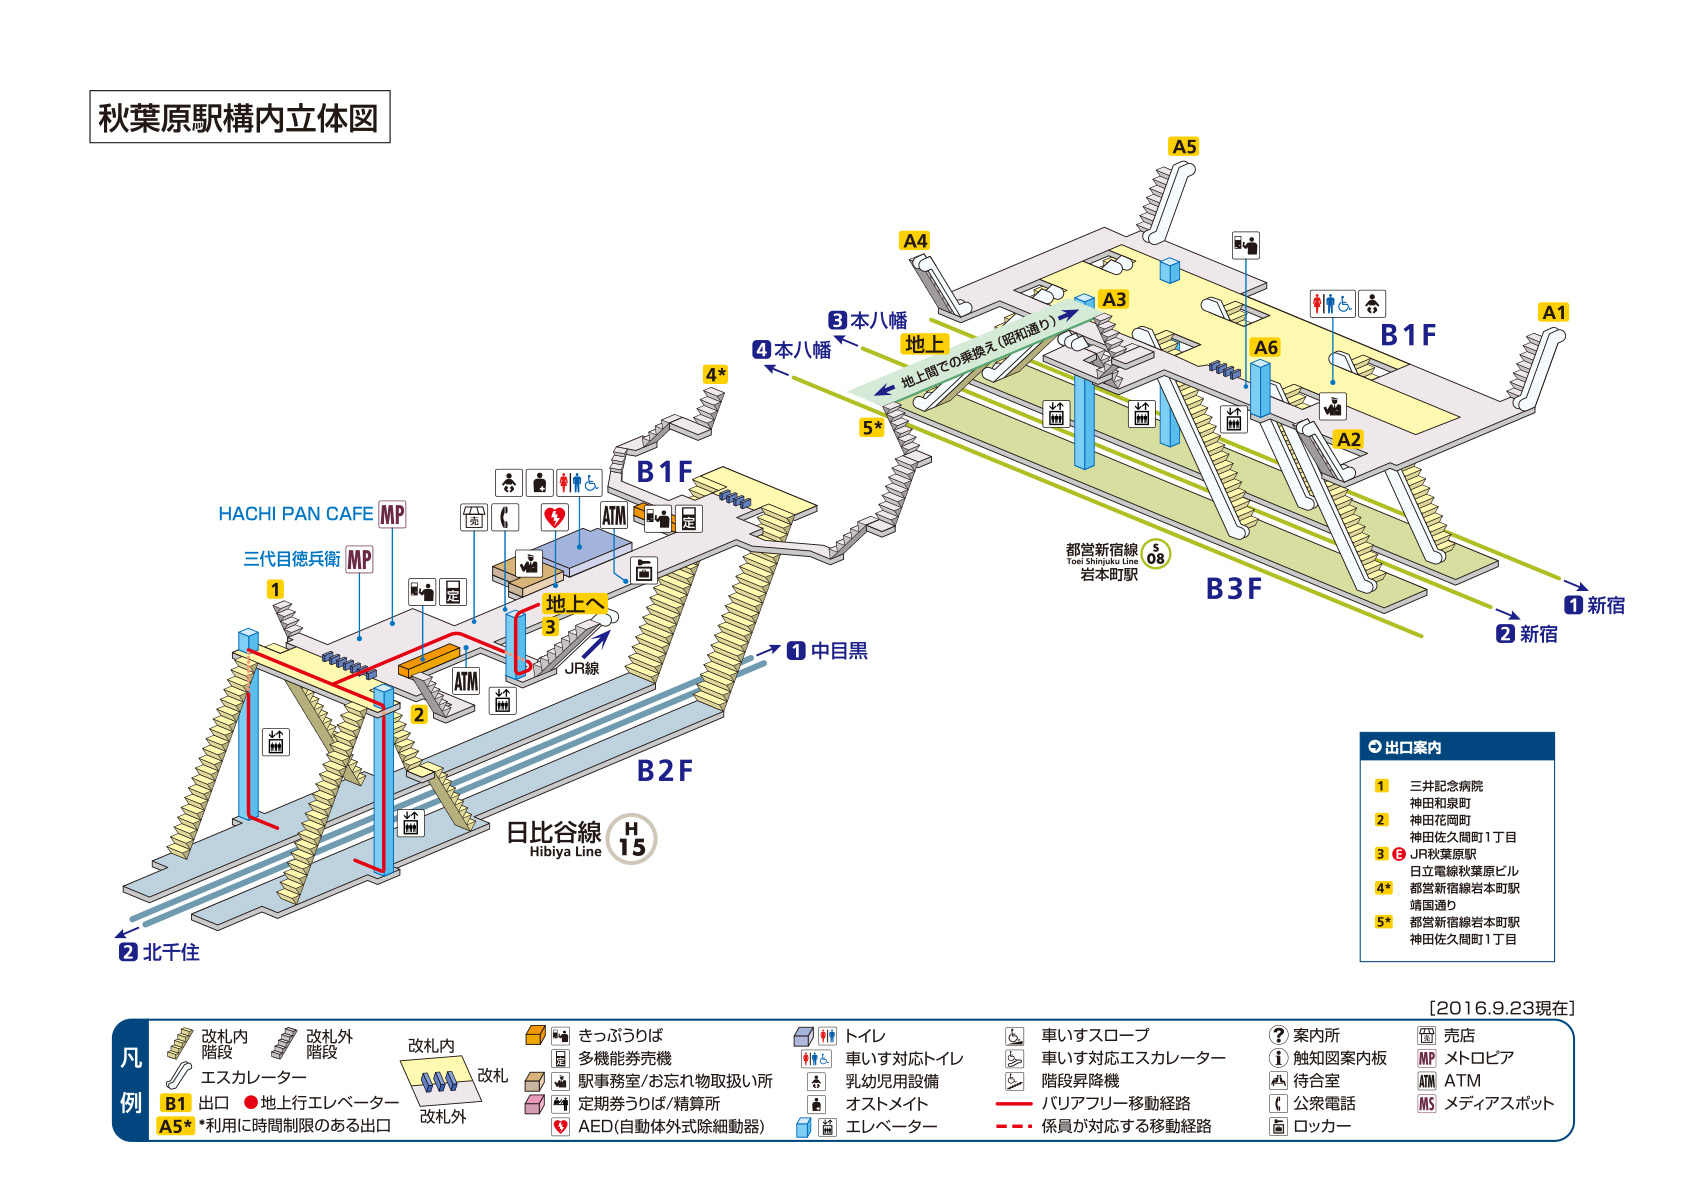 https://www.tokyometro.jp/station/yardmap_img/_station_%E7%A7%8B%E8%91%89%E5%8E%9F_yardmap_images_yardmap_2.jpg